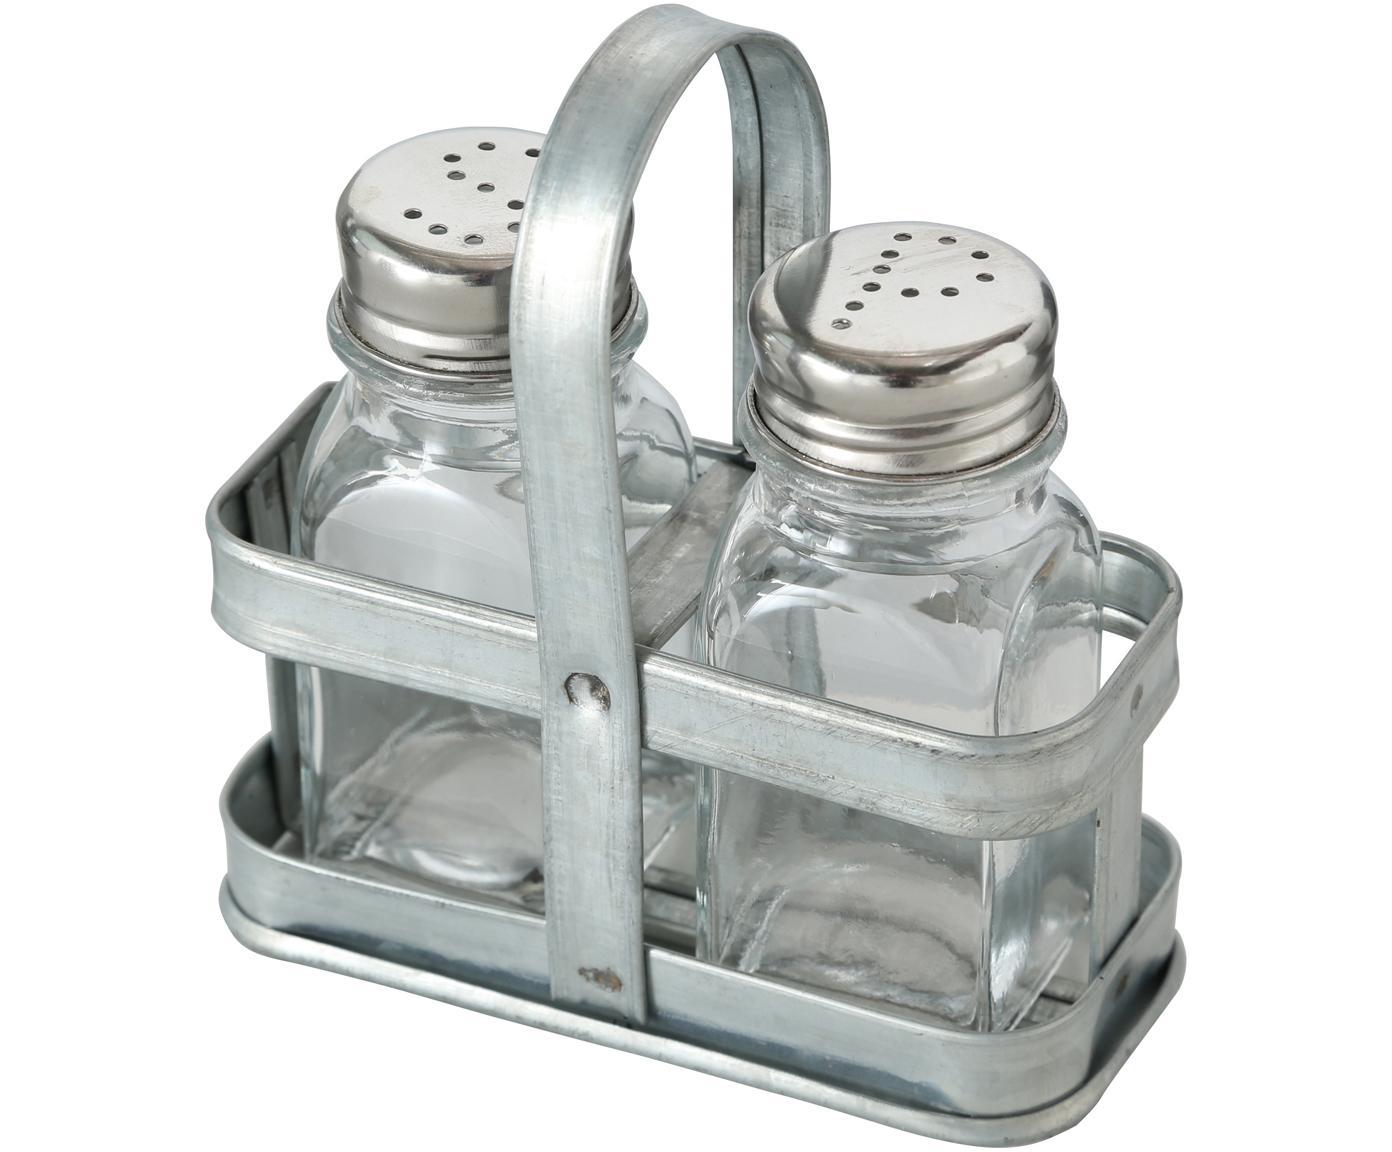 Zout- en peperstrooierset Edna, 3-delig, Houder: glas, Transparant, metaalkleurig, 12 x 12 cm